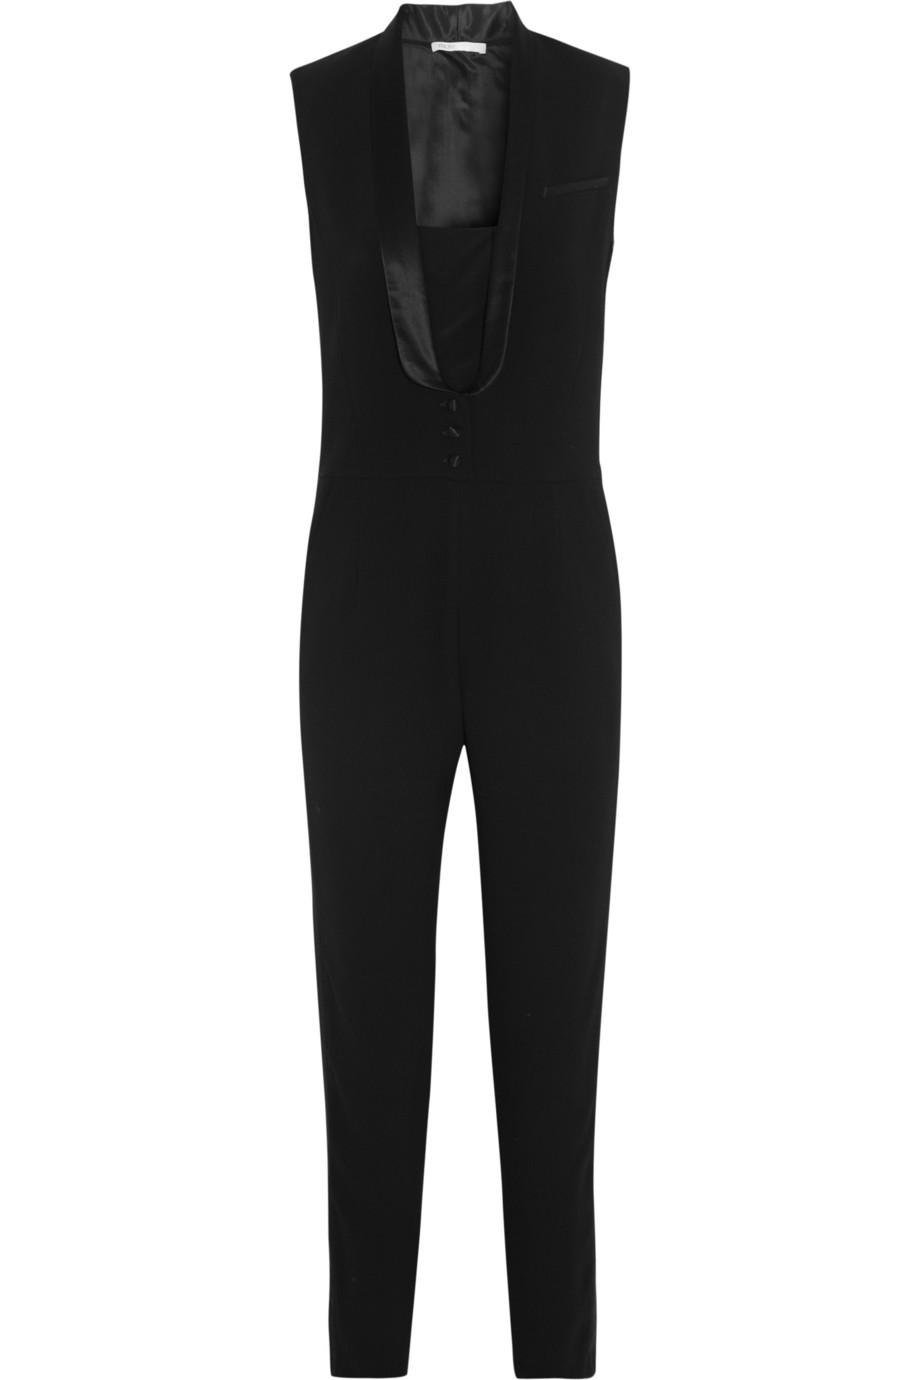 Maje black elfie satin trimmed crepe tuxedo jumpsuit